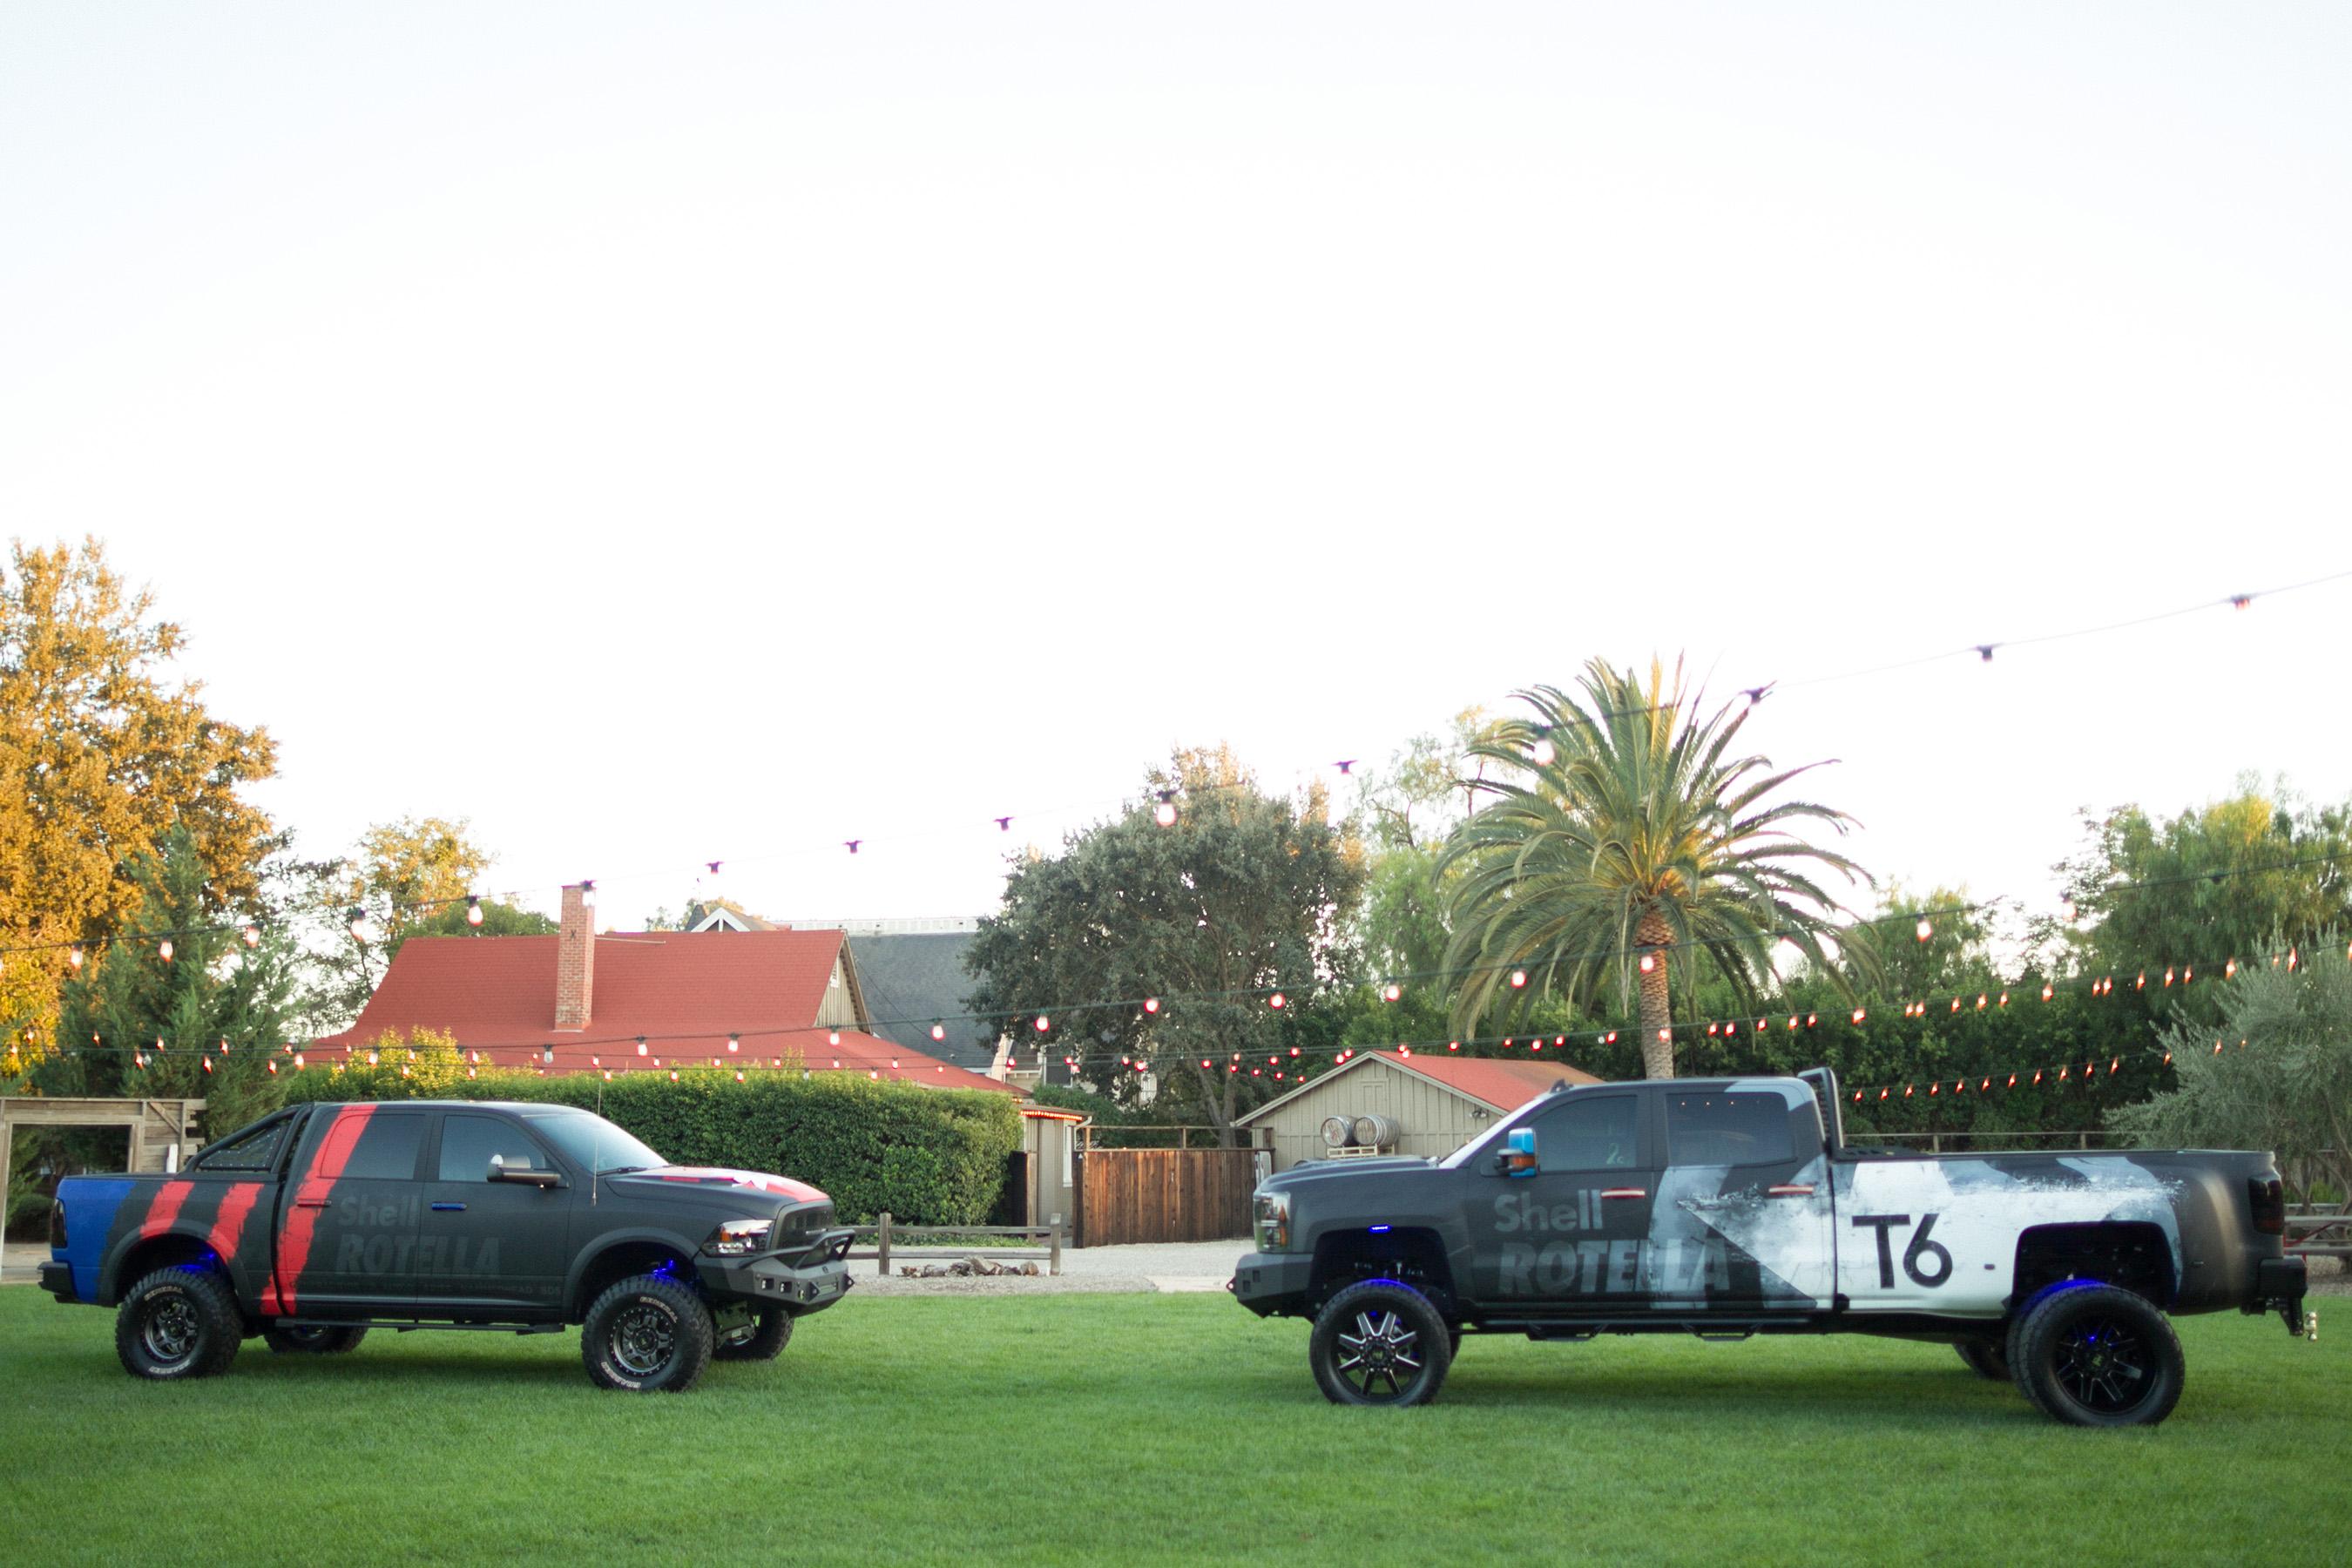 Tommy Pike Customs Shell ROTELLA 'Pickup Pride' Trucks